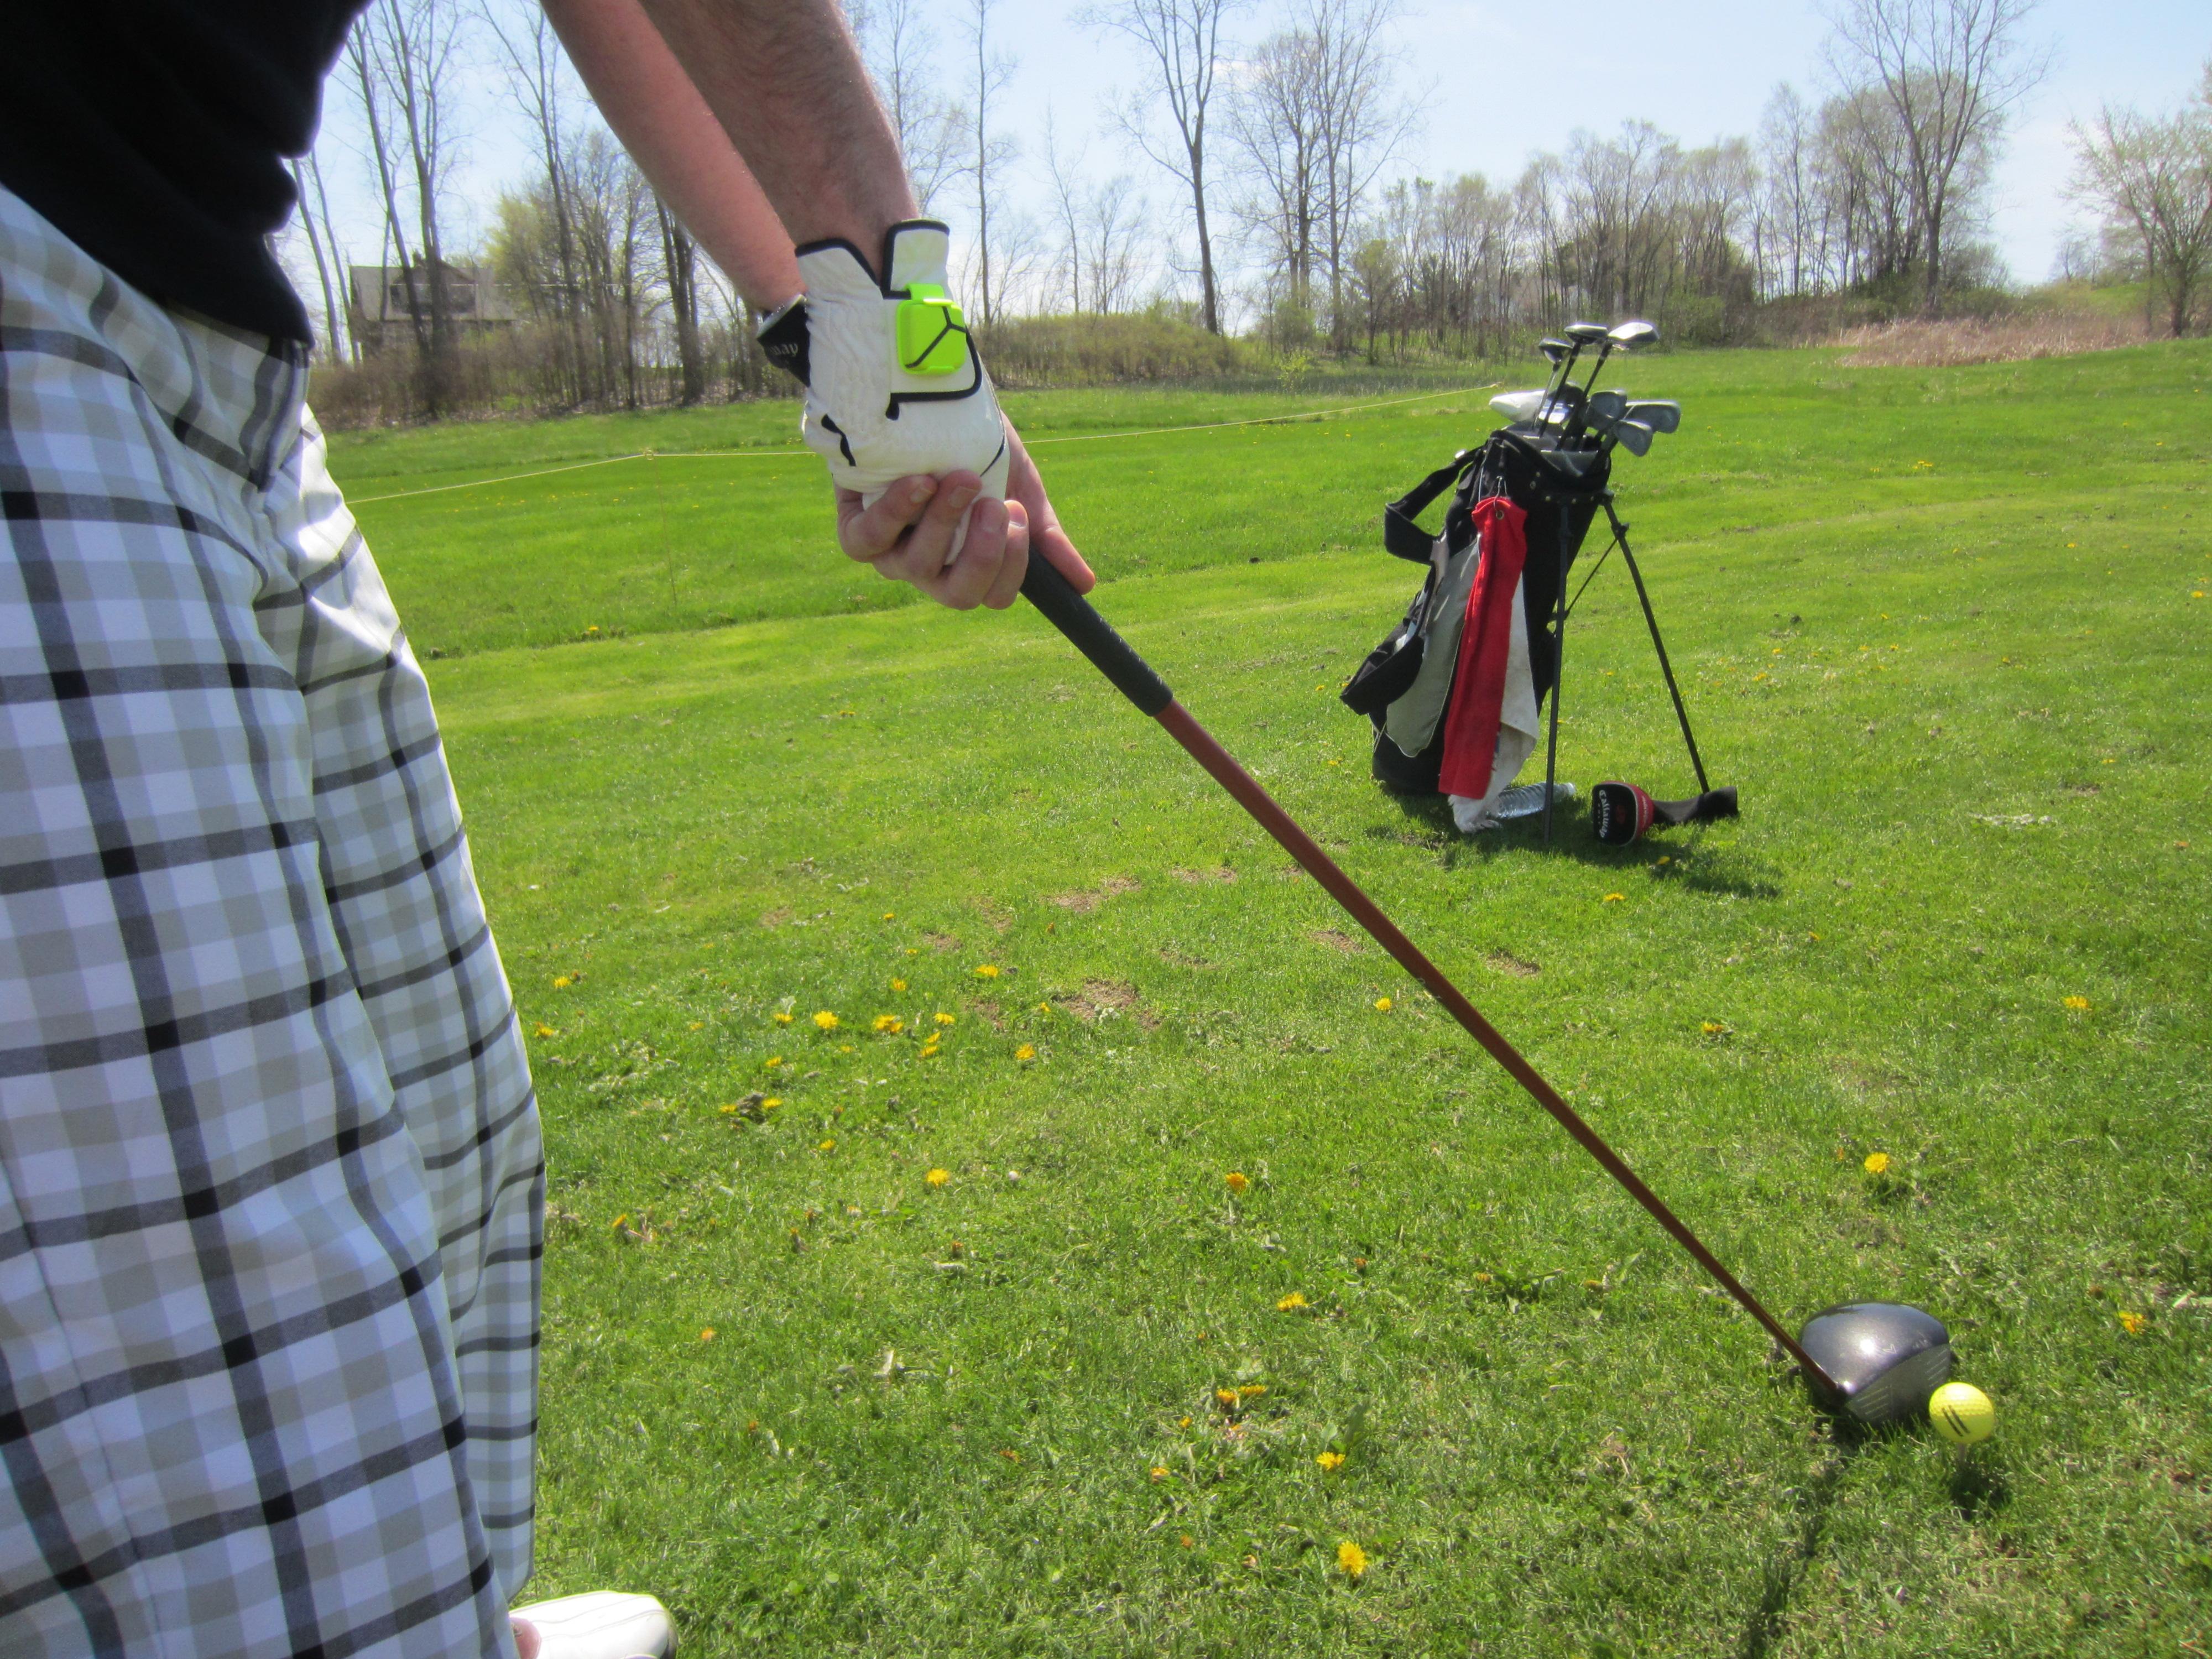 Top 5 Best Golf Swing Analyzer Reviews TheBullGolf